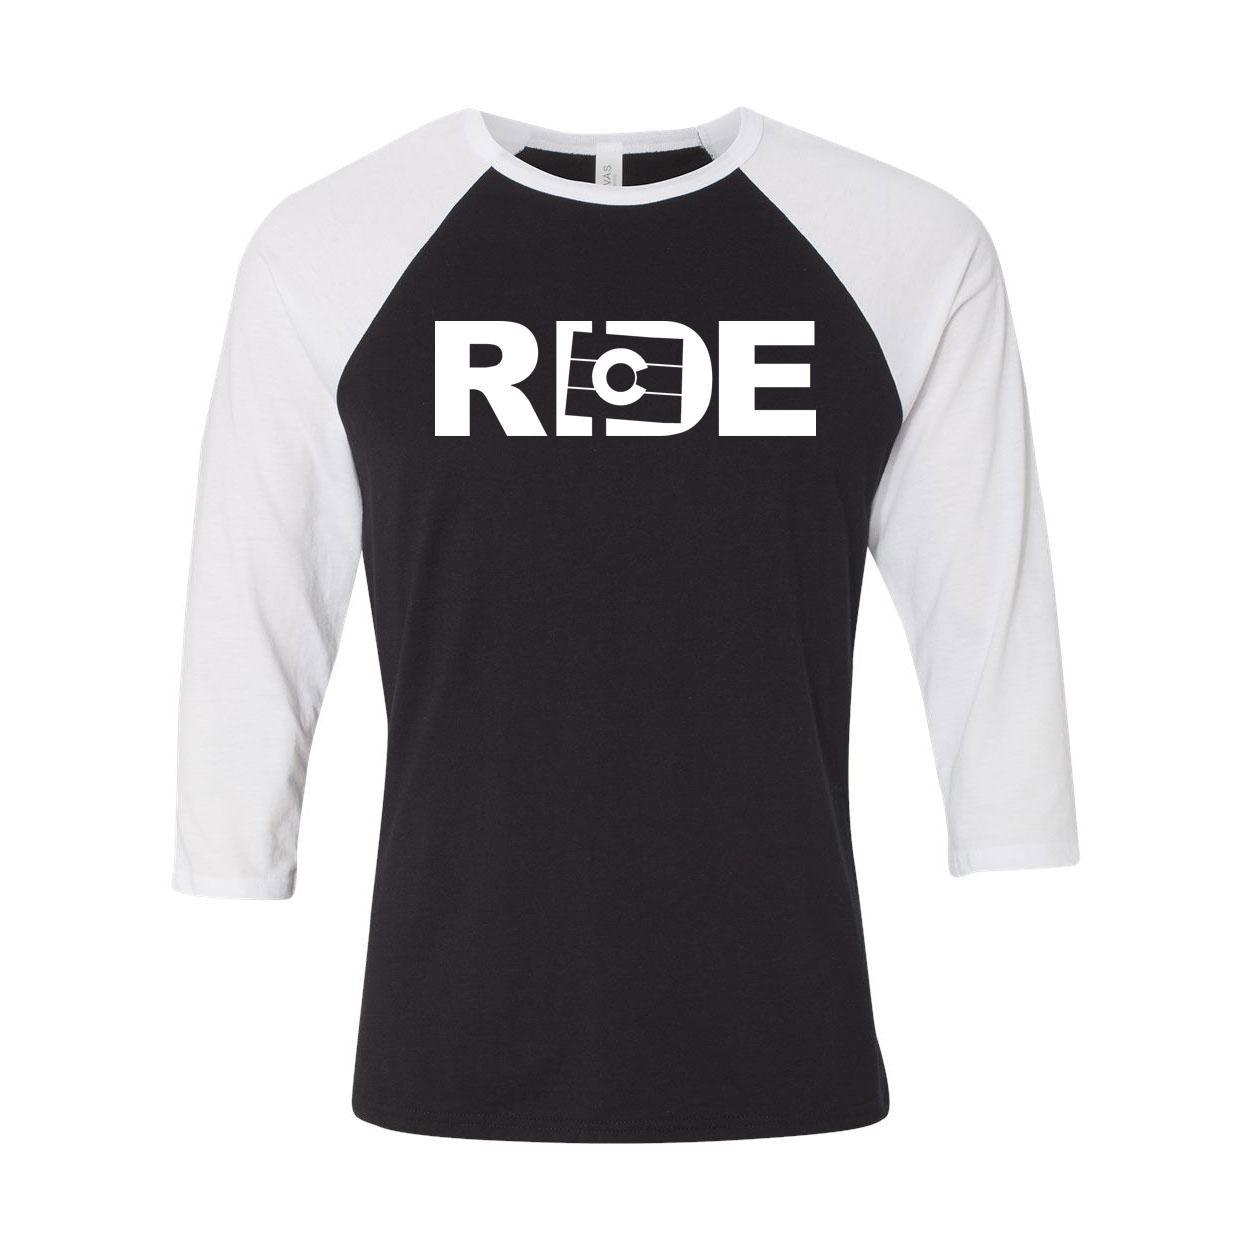 Ride Colorado Classic Raglan Shirt Black/White (White Logo)